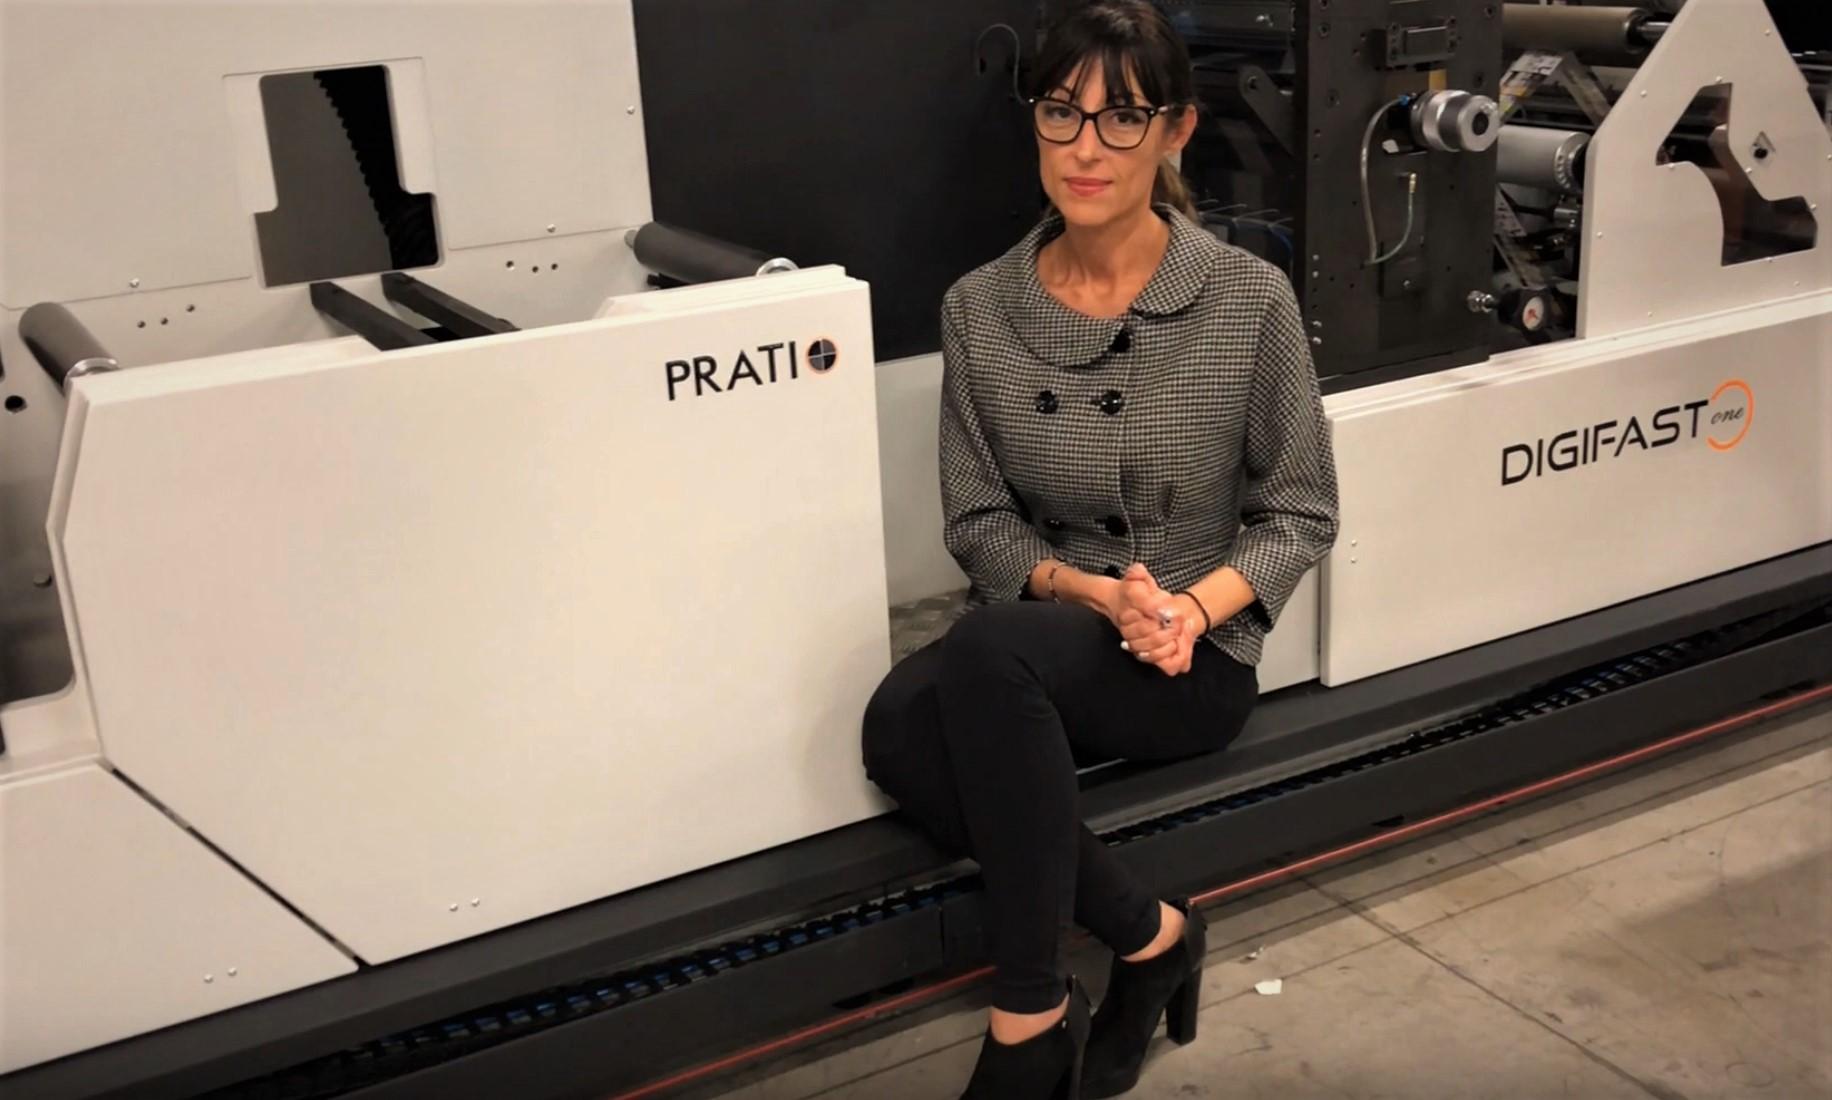 Chiara Prati